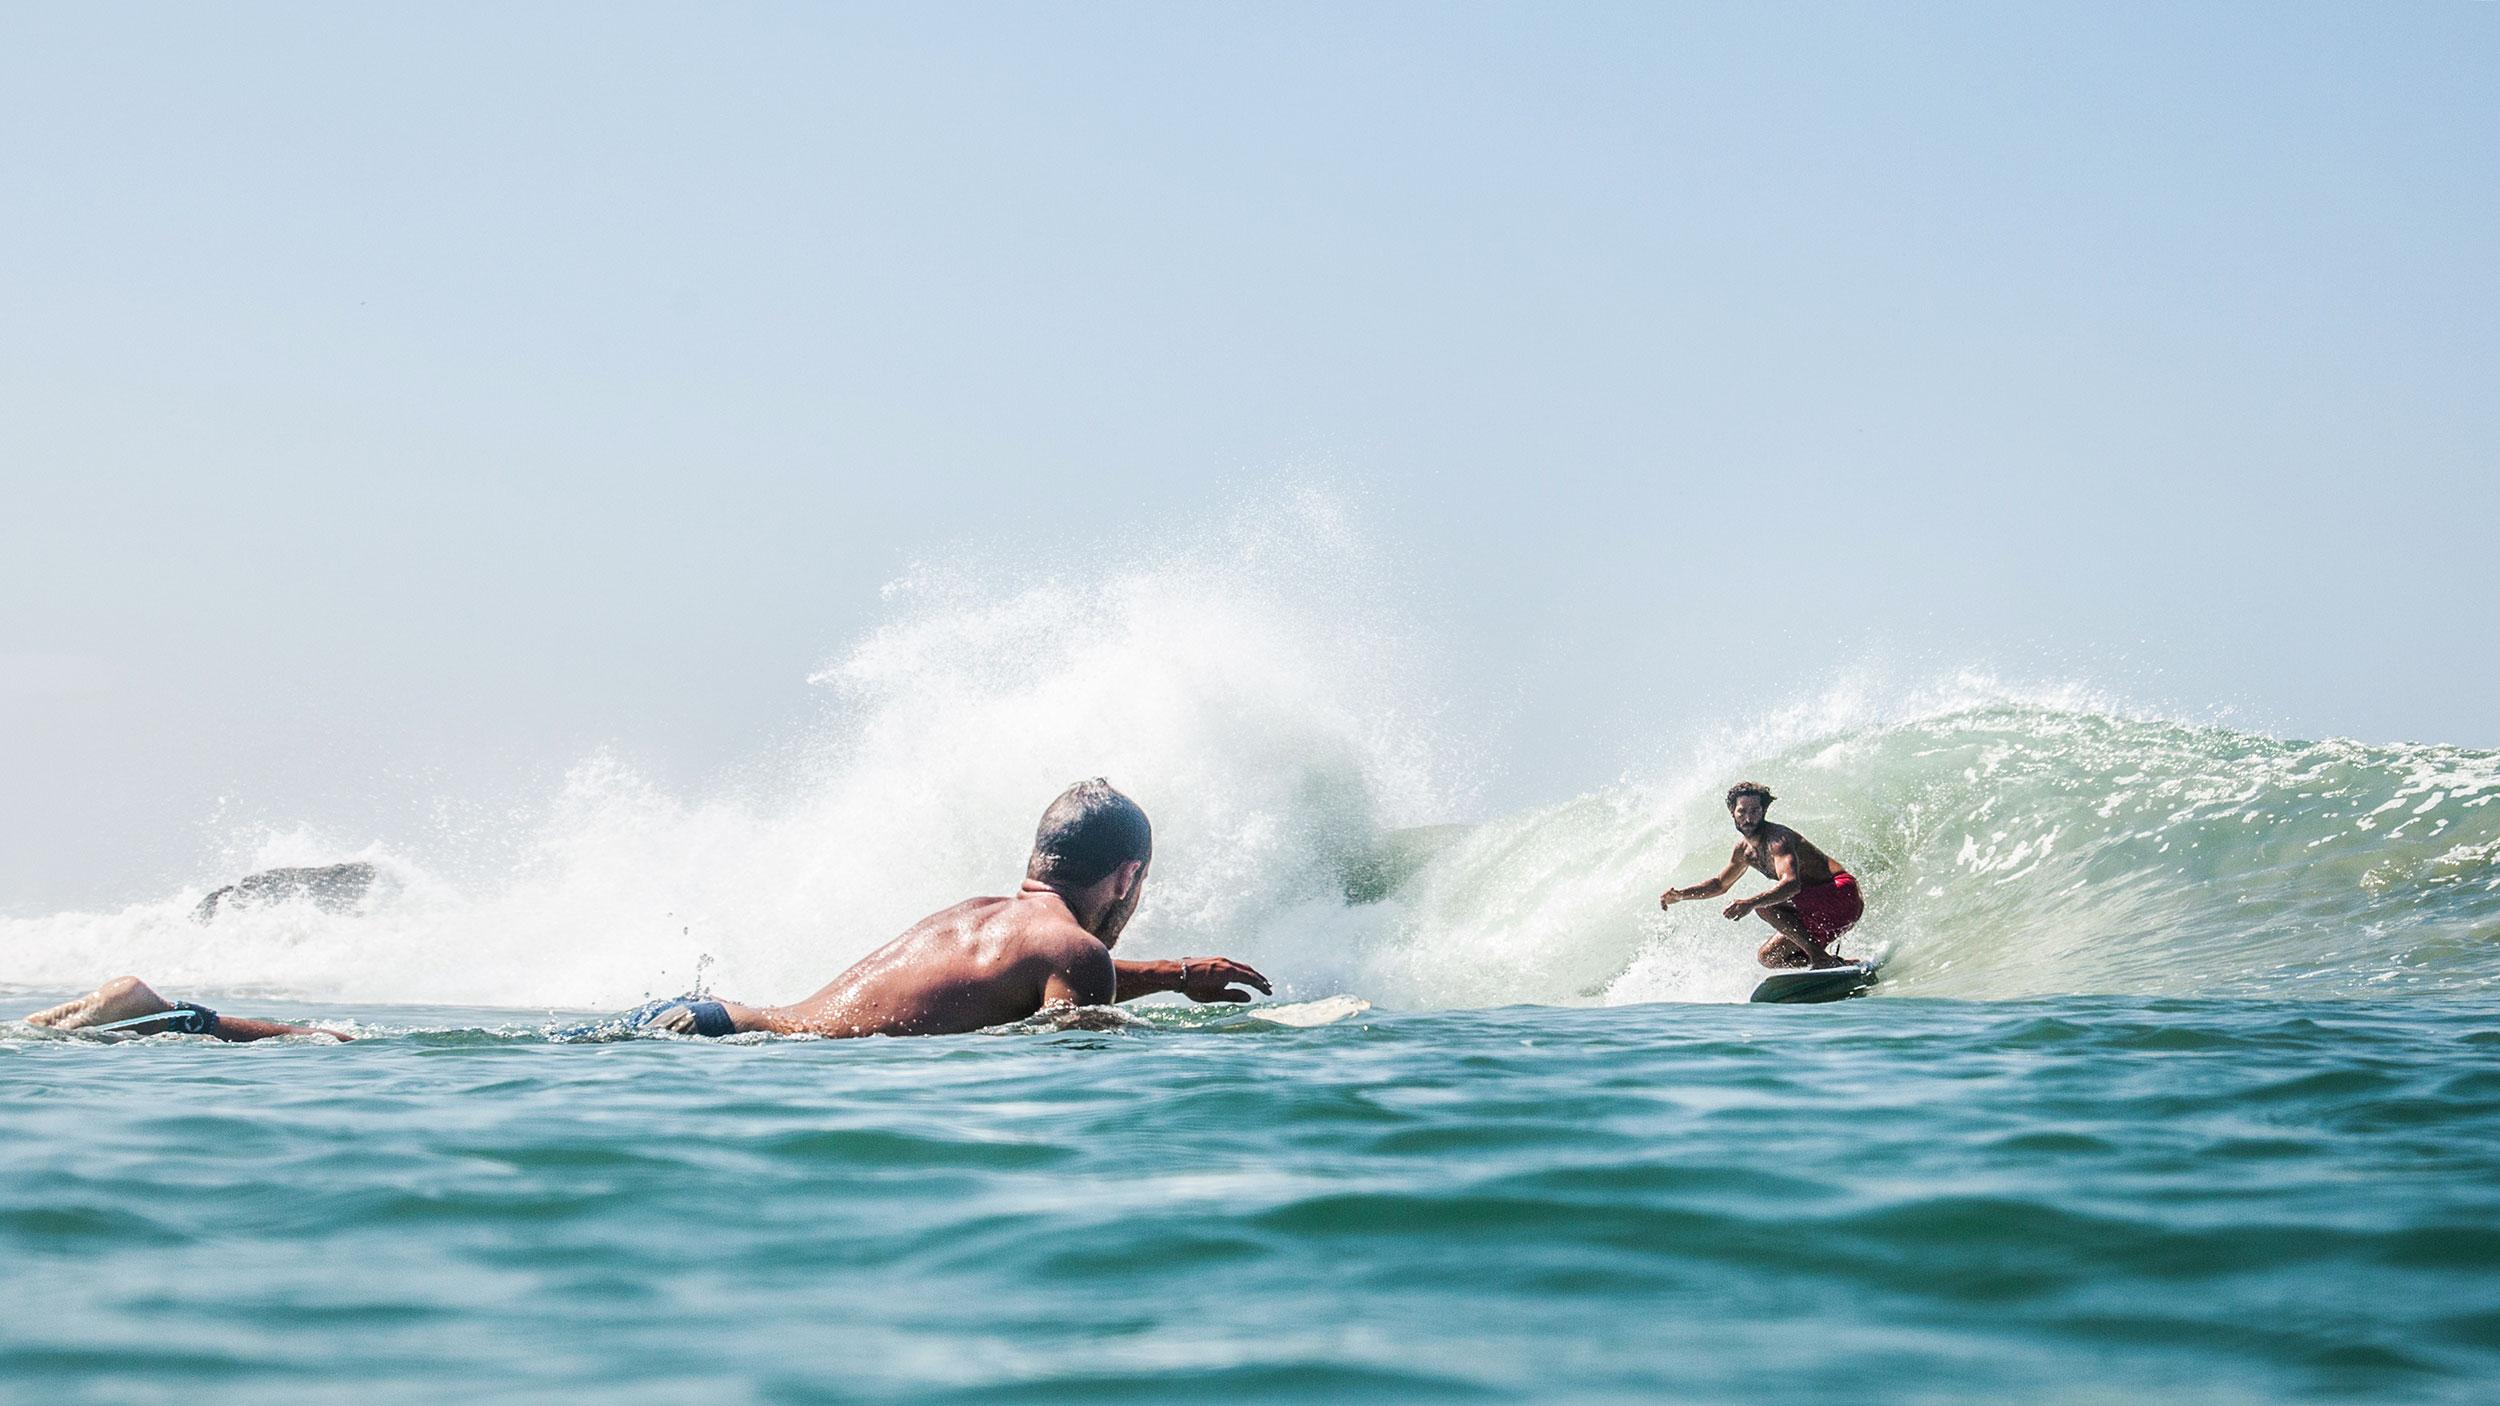 Franco negotiates a wave at Edawa beach. PHOTO: Berta Tilmante